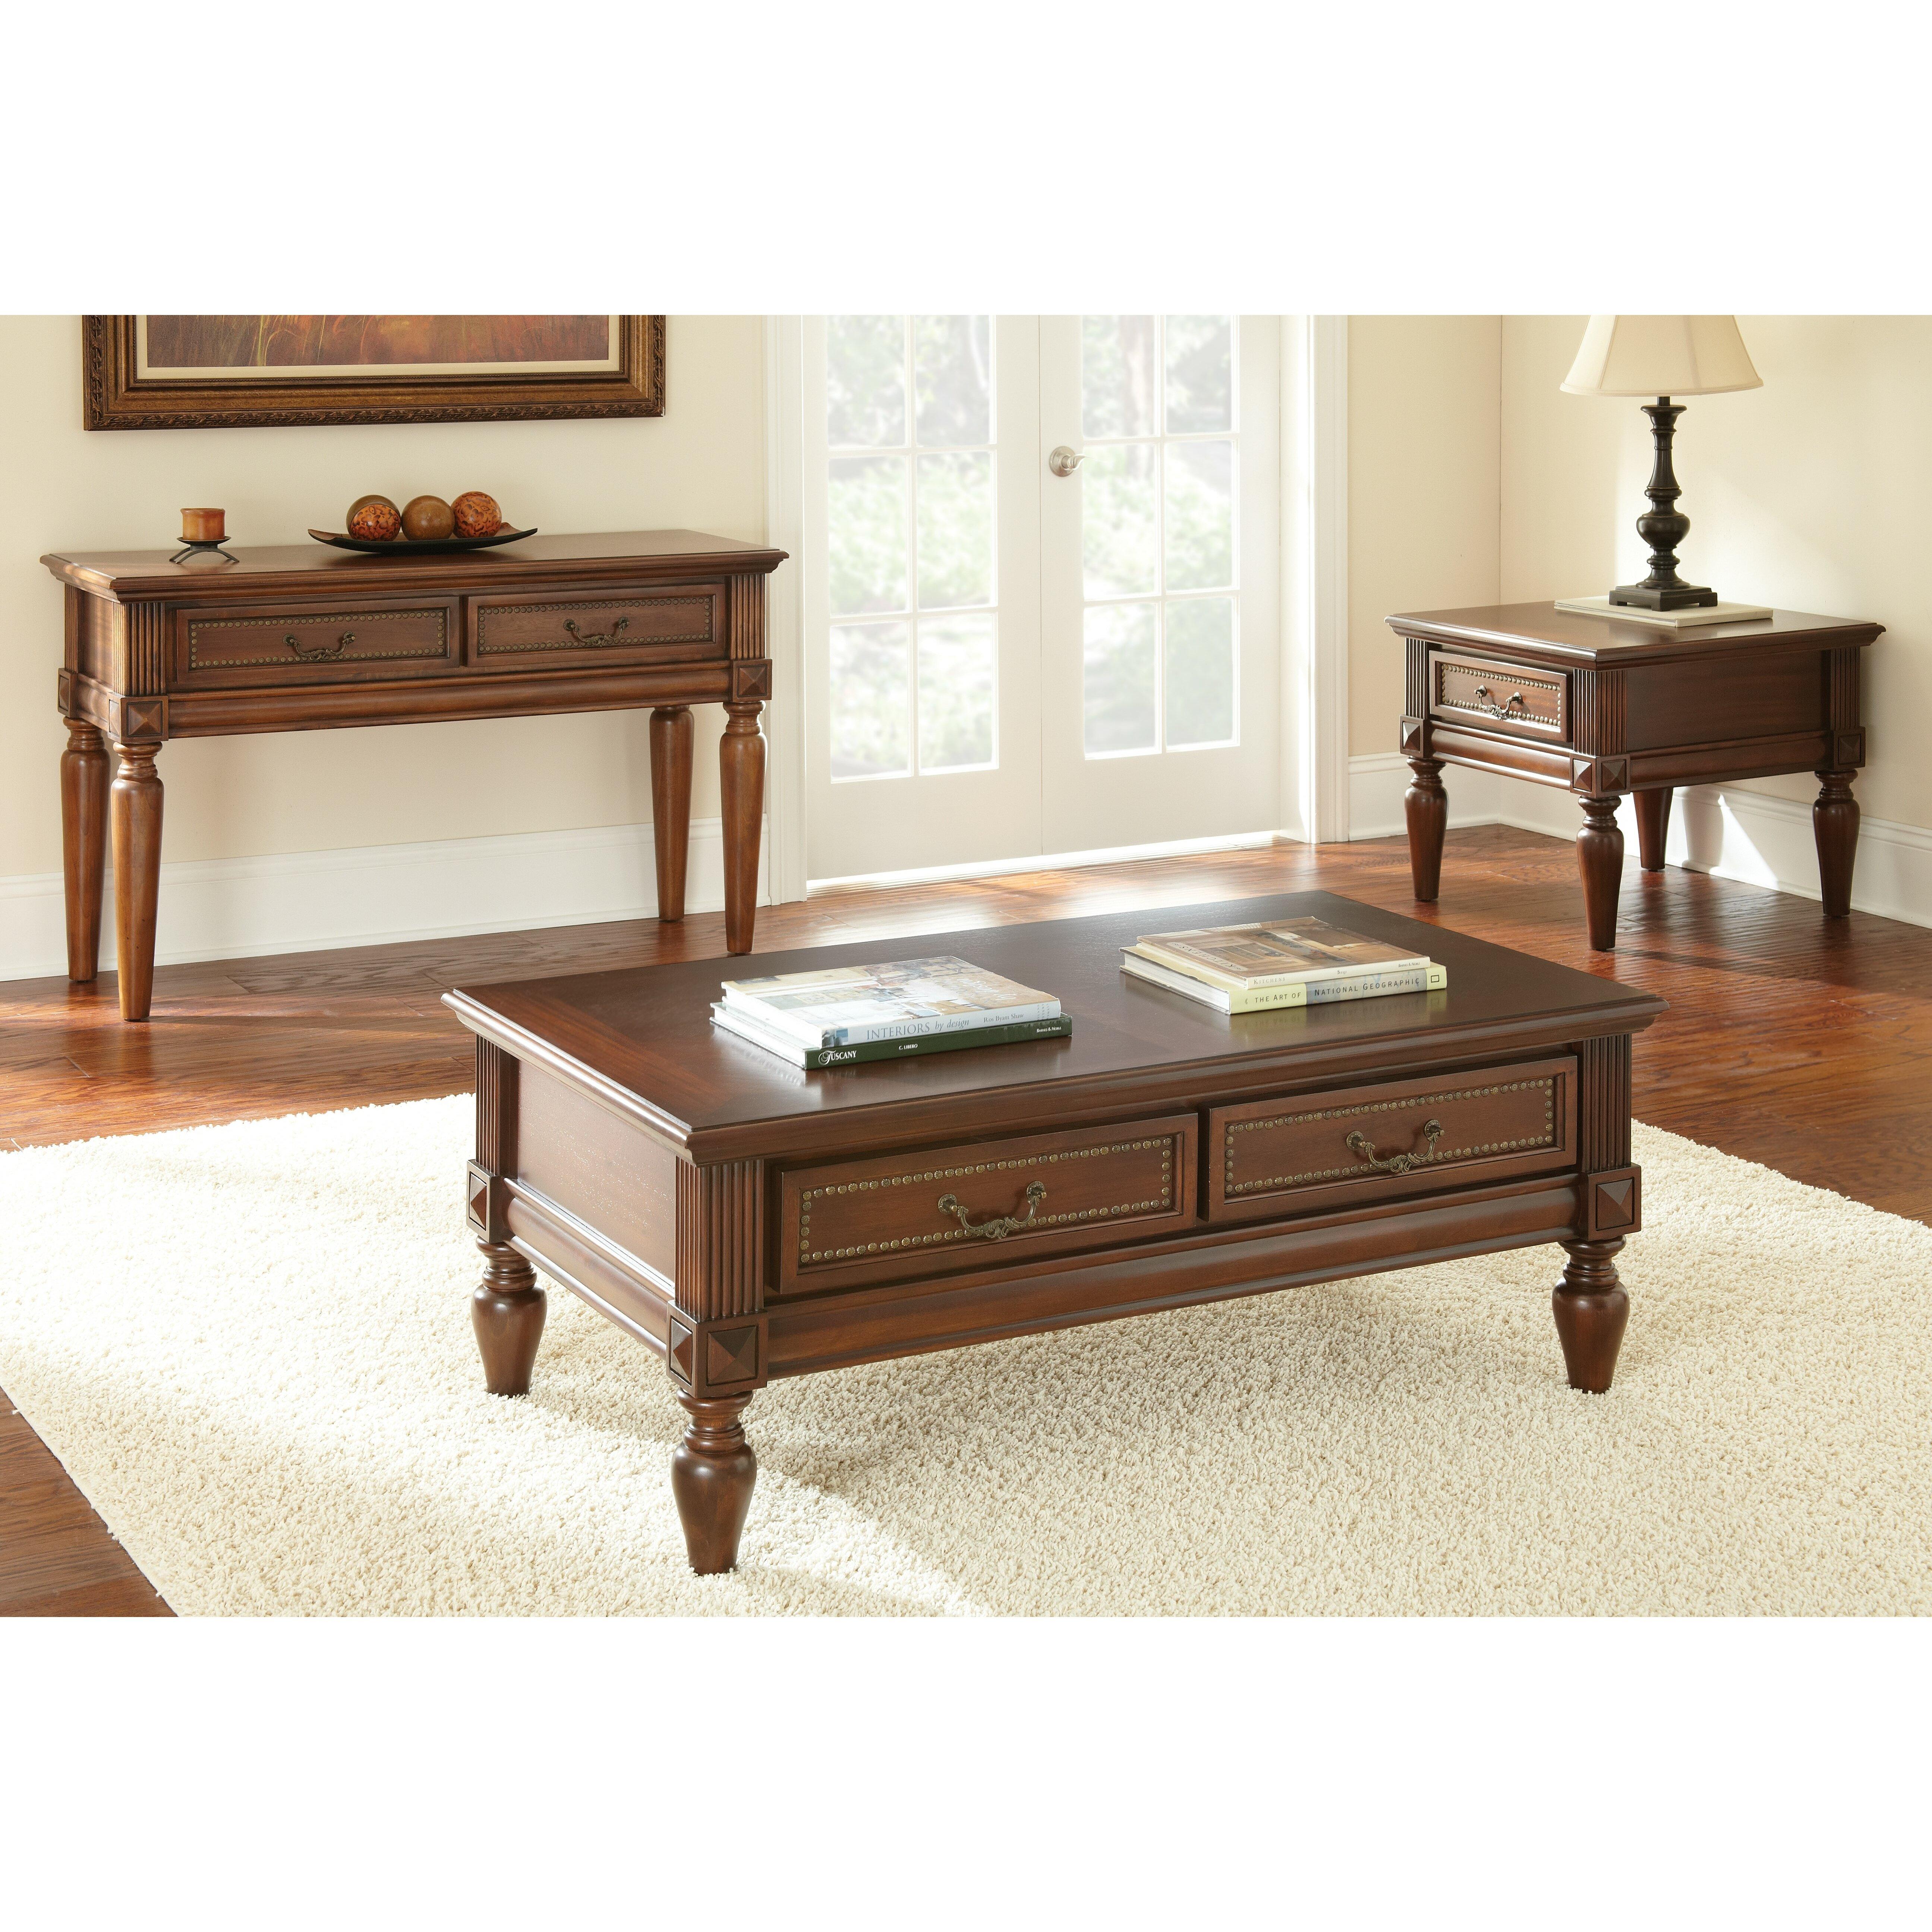 Steve Silver Furniture Davina Console Table Reviews